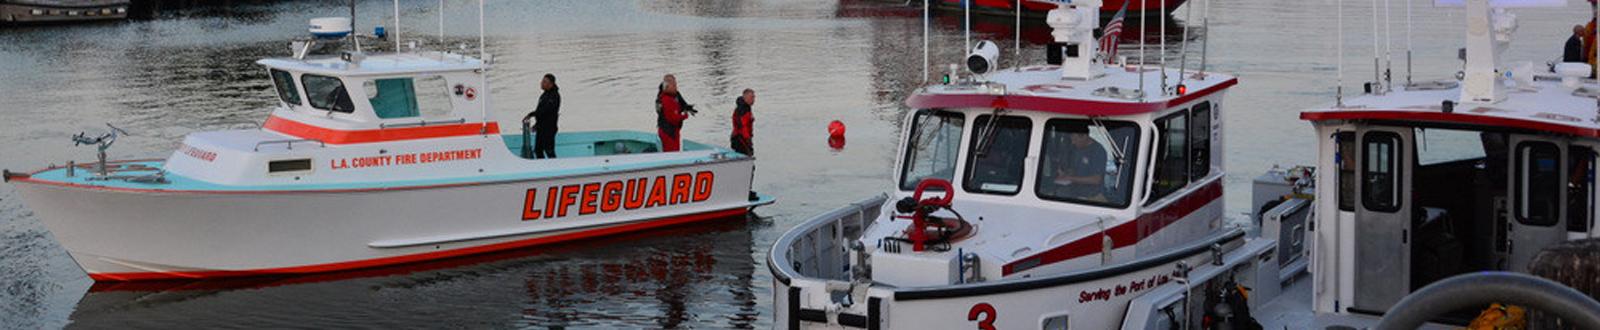 LAFD maritime boats and lifeguard